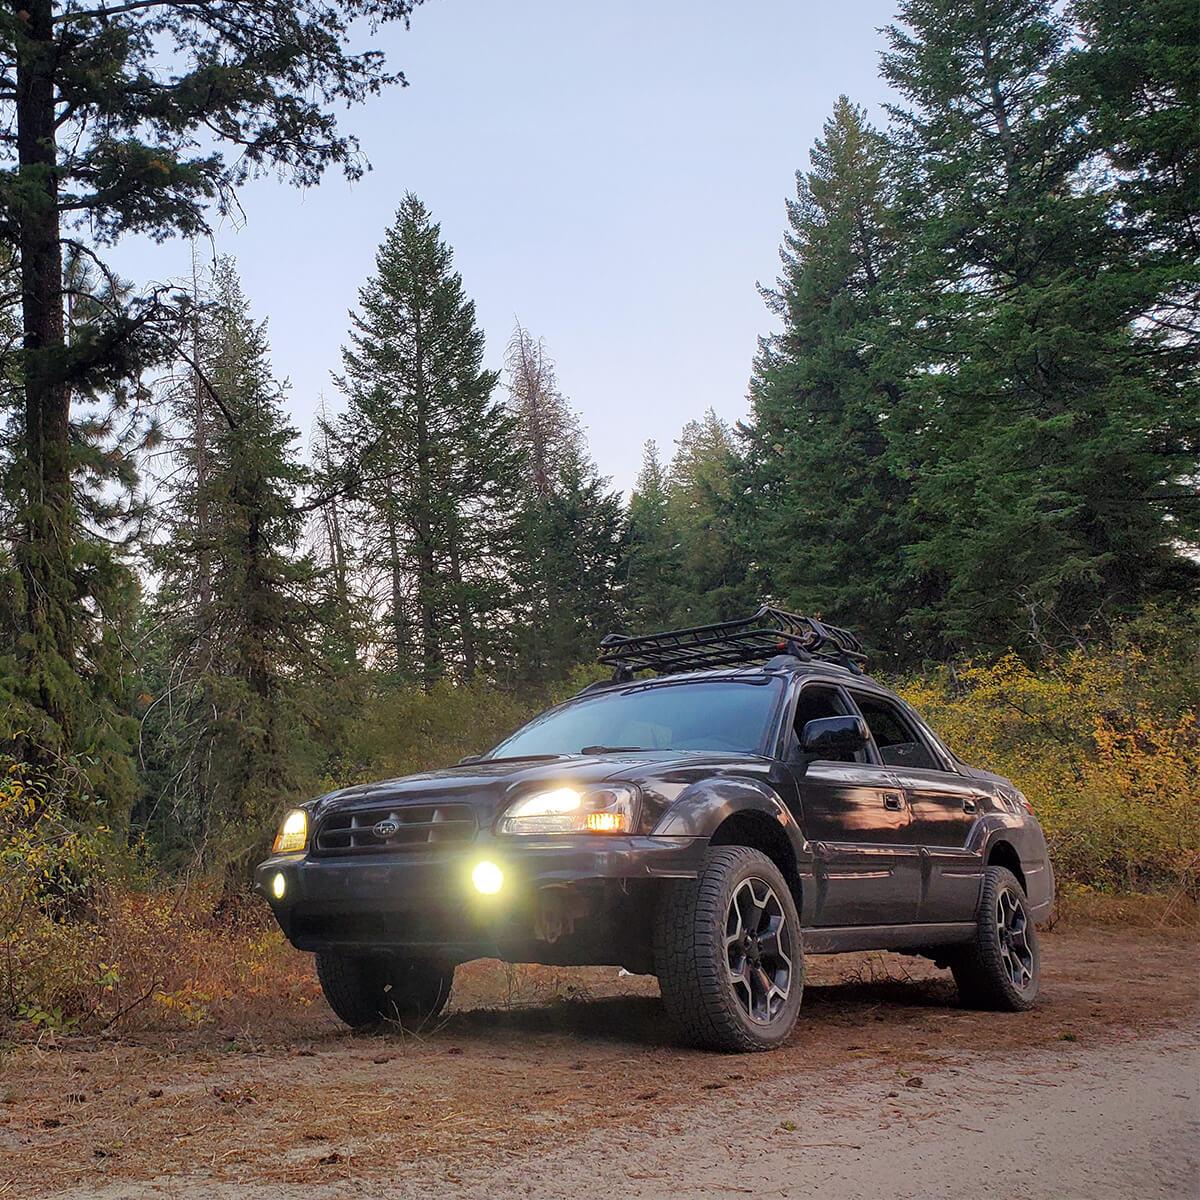 Subaru Baja 2 inch lift kit